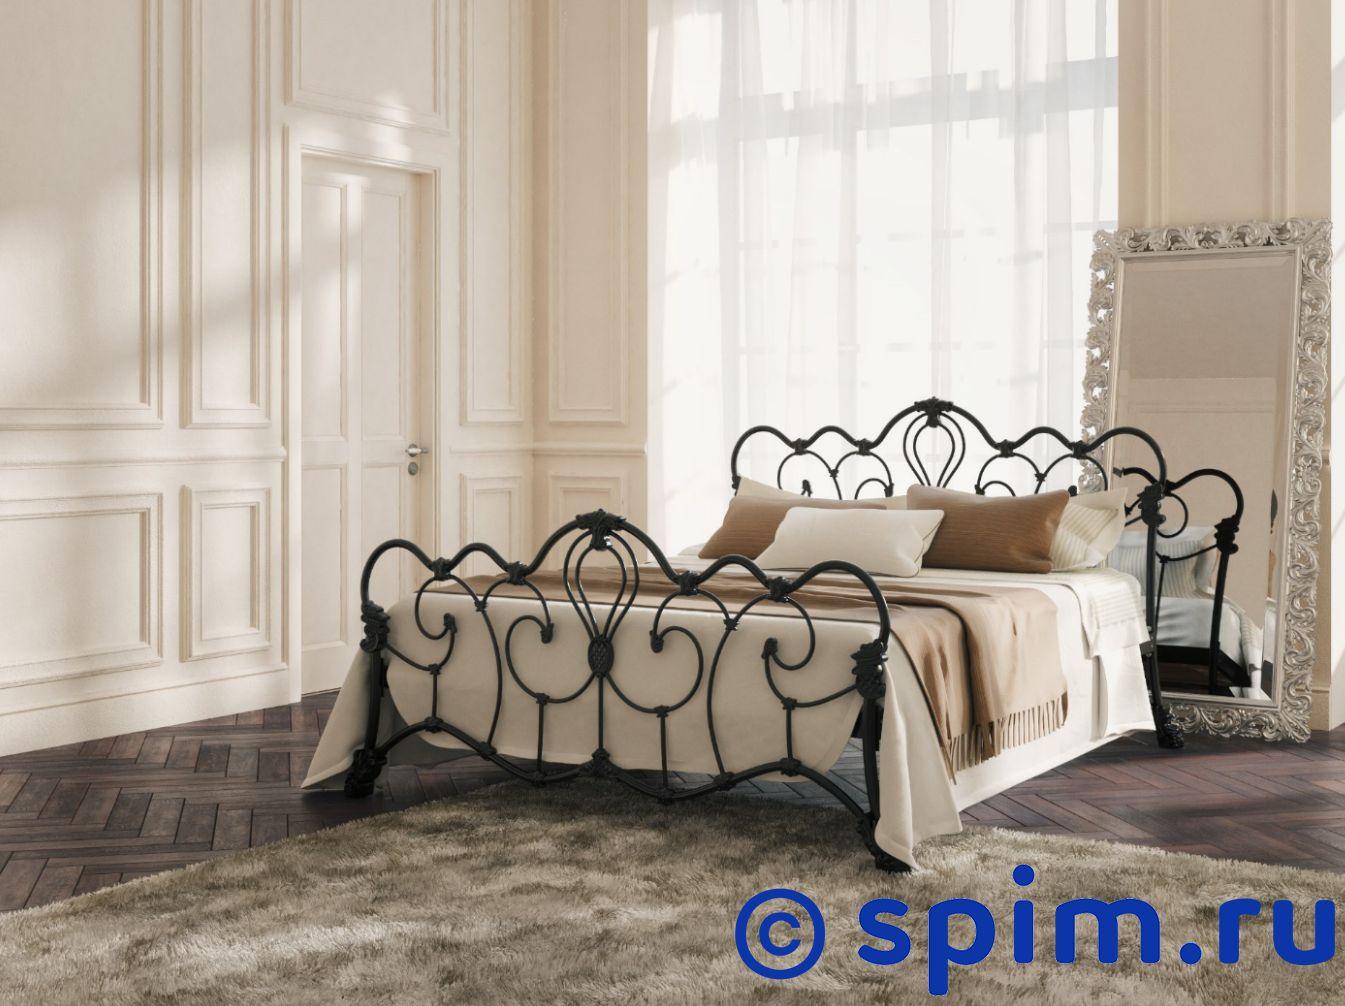 Кровать Originals by Dreamline Michelle (1 спинка) 140х200 см наматрасник dreamline латекс 60 мм 90x190